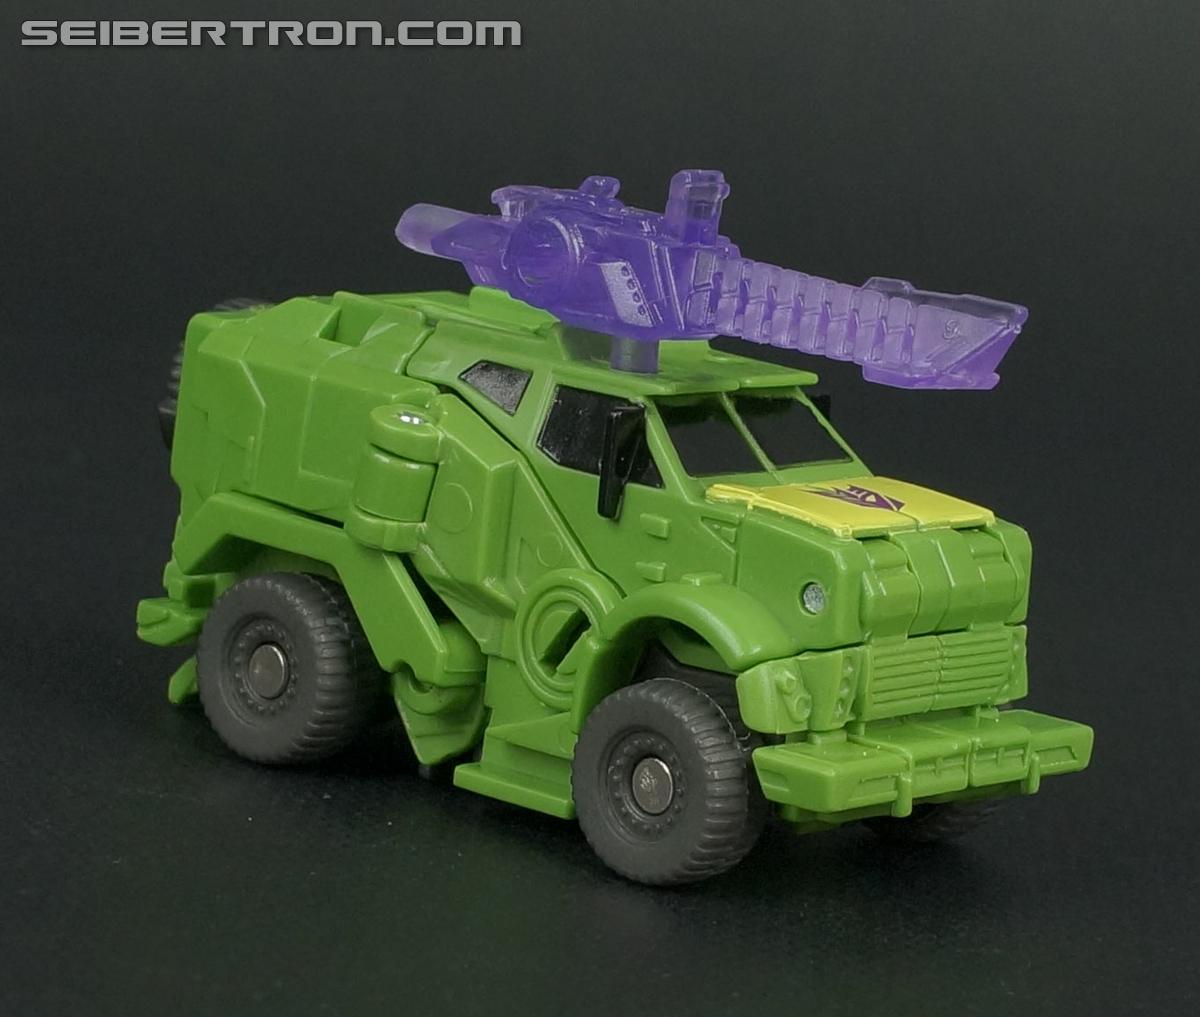 Transformers Prime Beast Hunters Cyberverse Breakdown (Apex Hunter Armor) (Image #28 of 96)